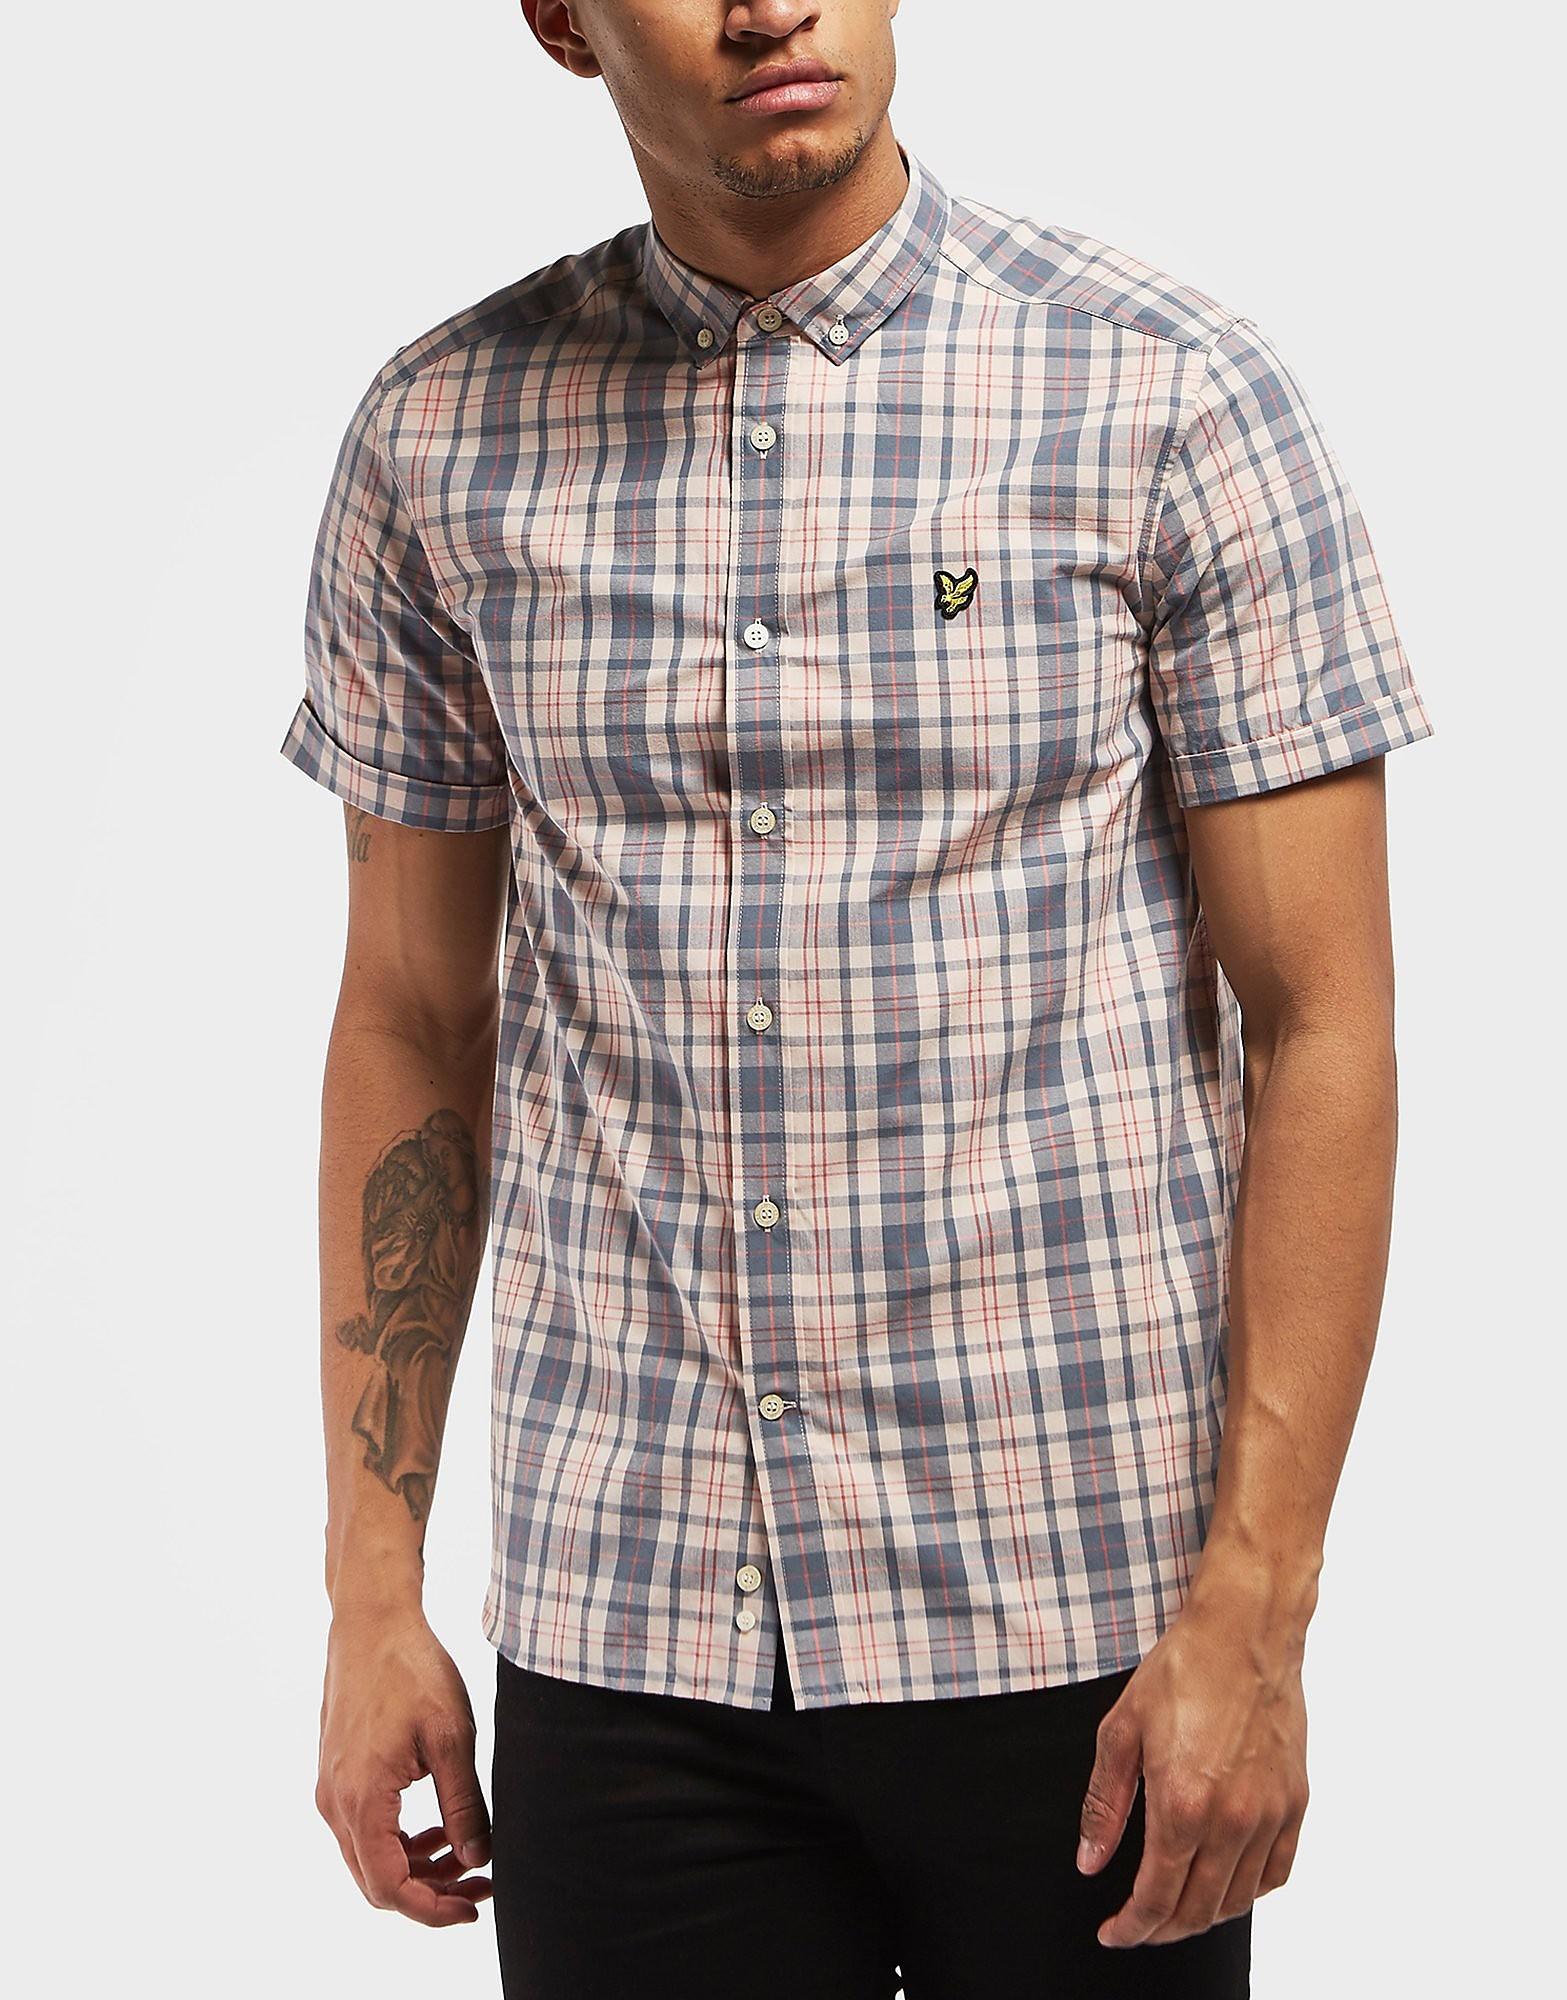 Lyle & Scott Short Sleeve Check Shirt - Online Exclusive